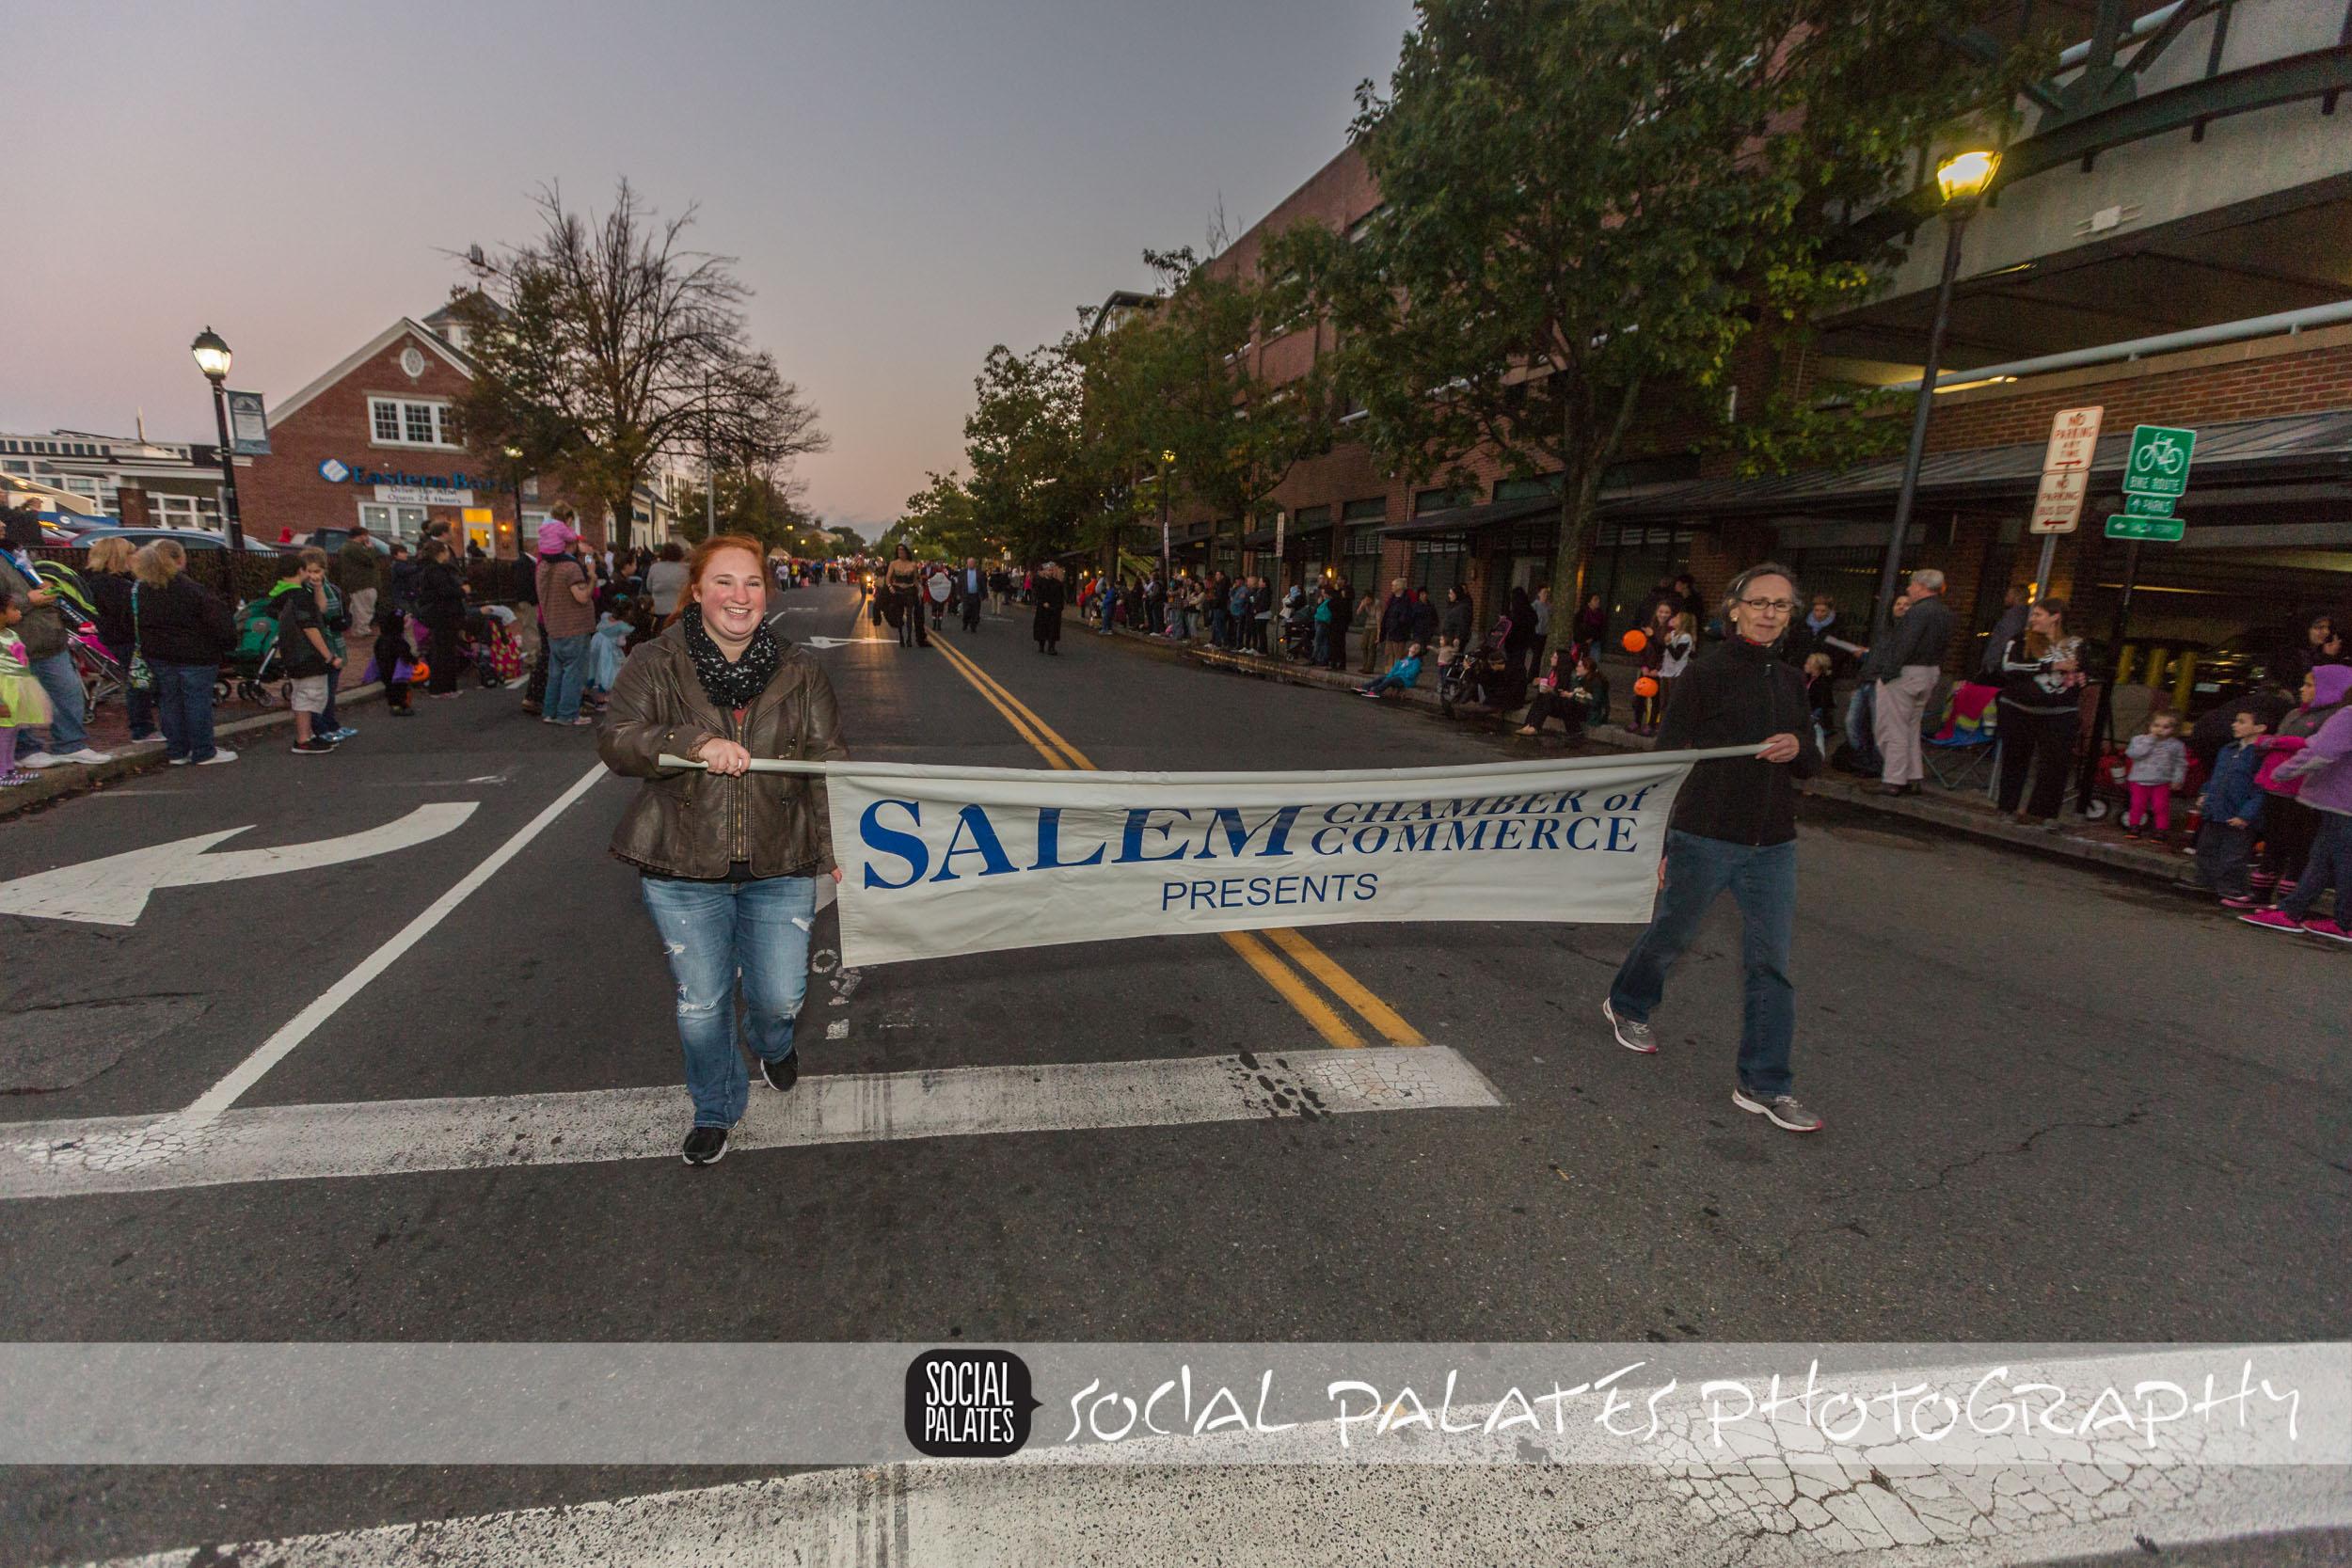 Haunted Happenings Parade 2014 Creative Salem by Social Palates-7286.jpg